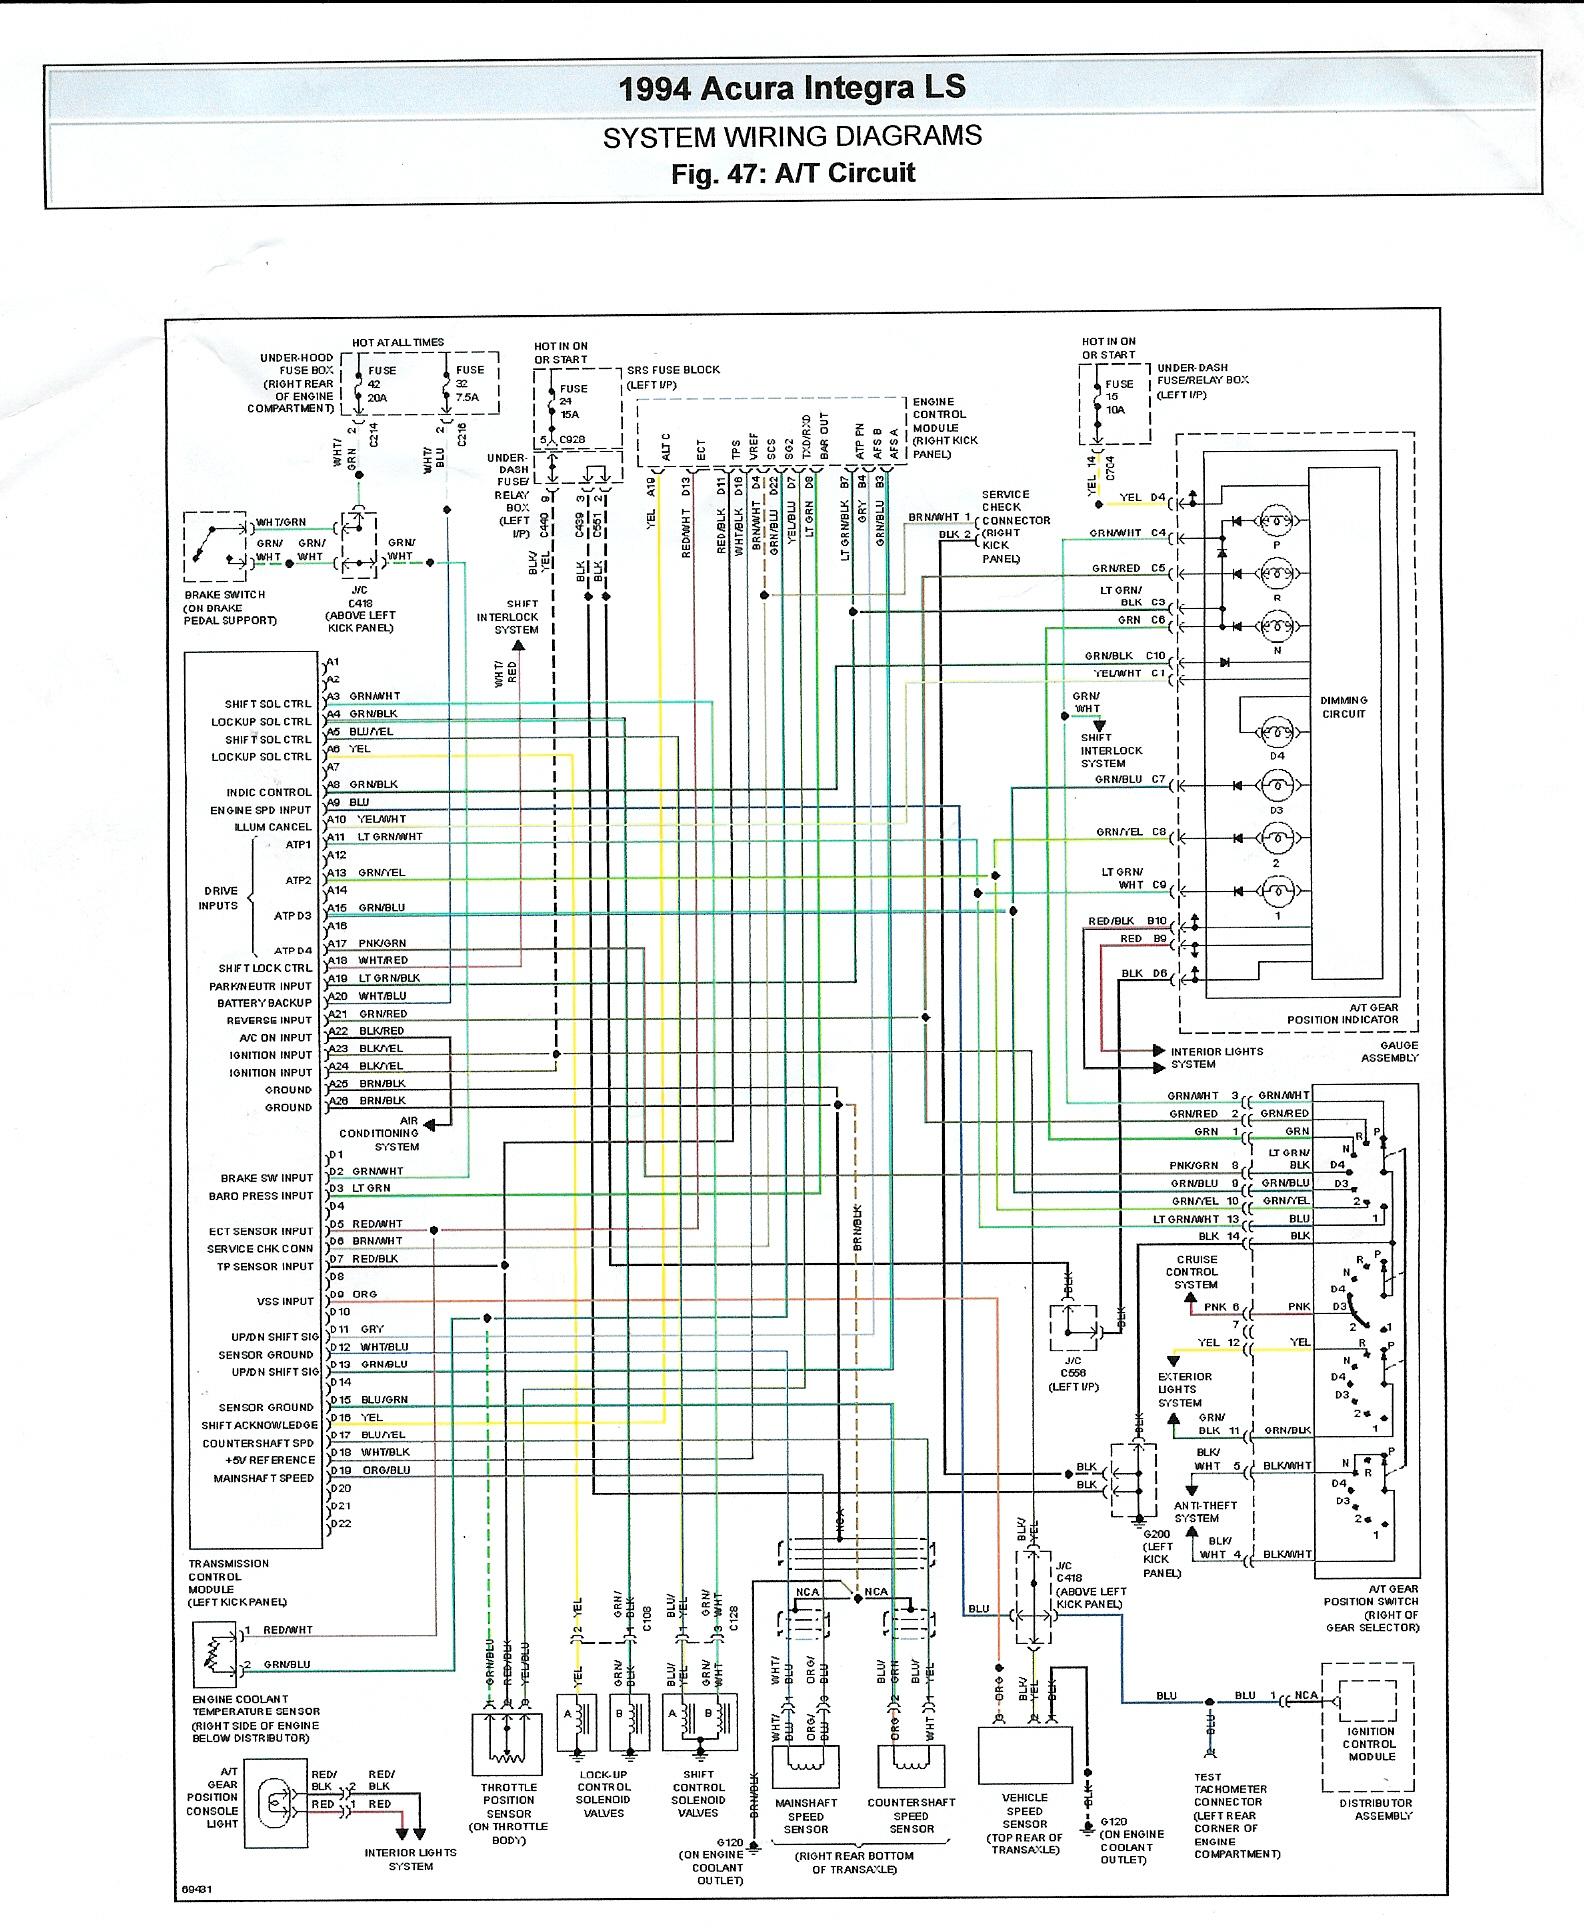 403664d1445082998 integra tcm wiring schematic auto swap tcm?resize\\\\\\\\\\\\\\\\\\\\\\\\\\\\\\\\\\\\\\\\\\\\\\\\\\\\\\\\\\\\\\\=665%2C811 b18c wiring diagram wiring diagram data